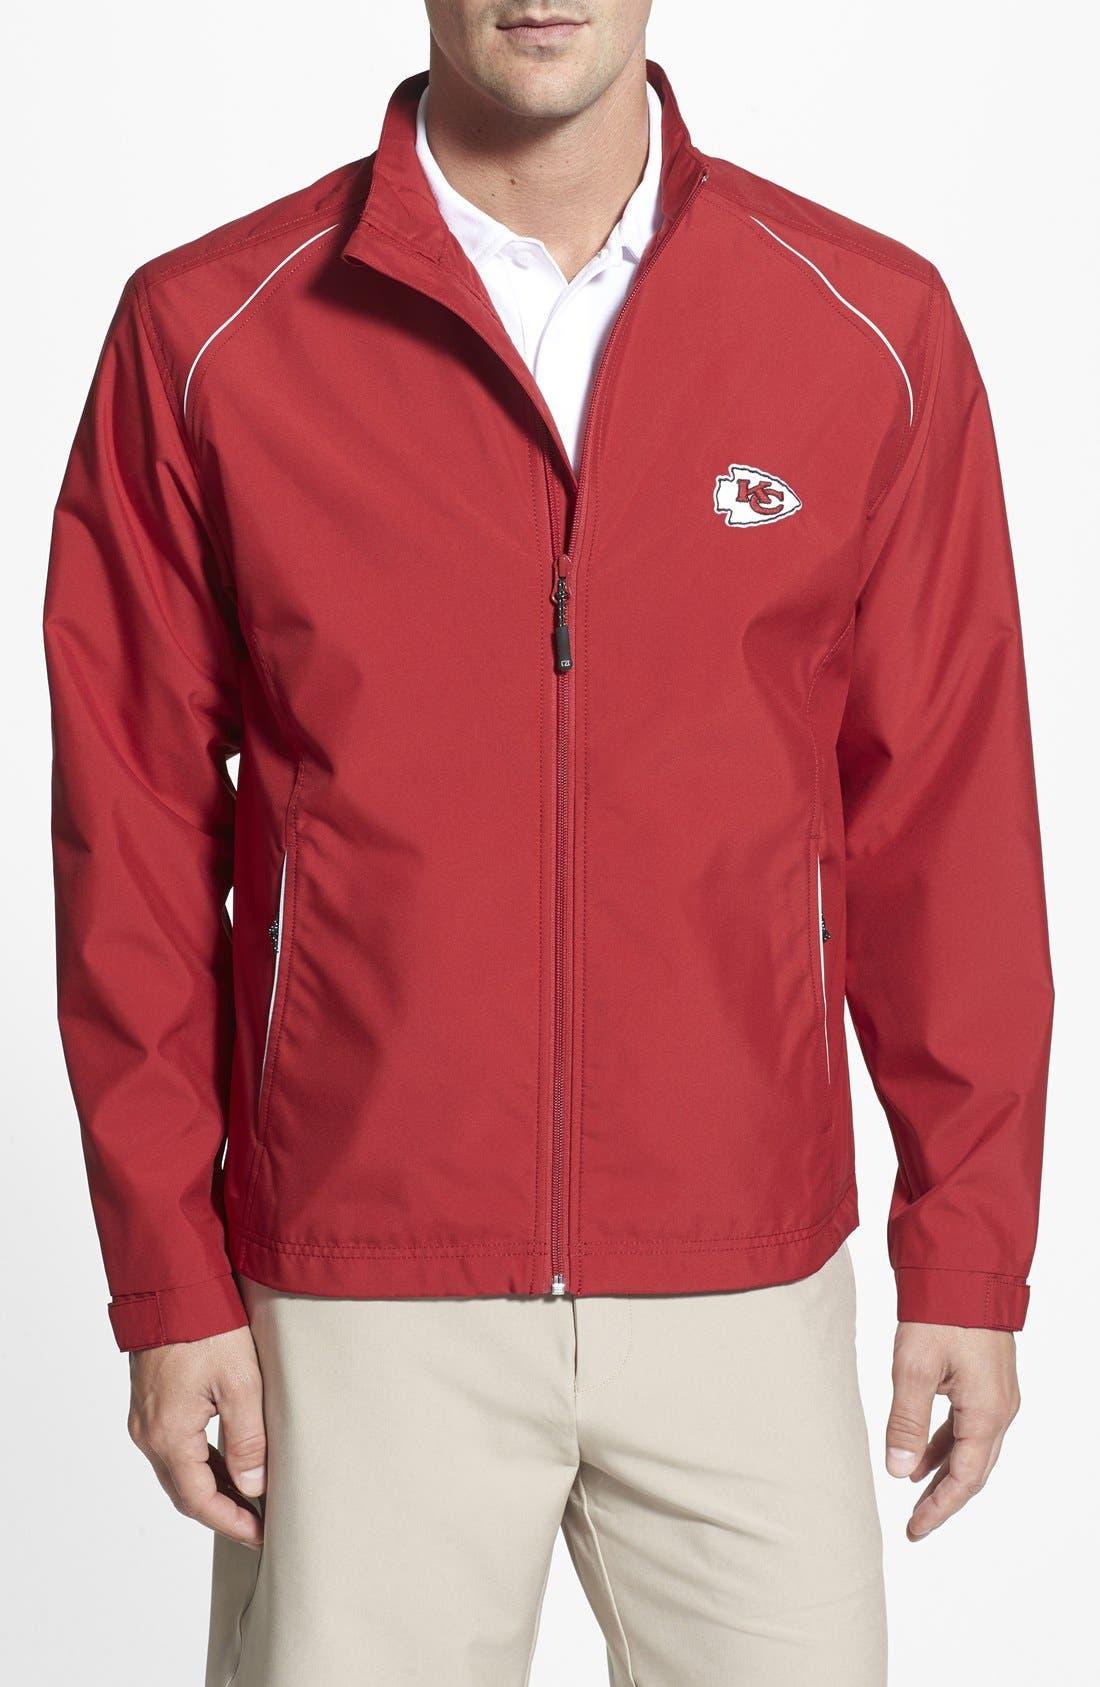 Kansas City Chiefs - Beacon WeatherTec Wind & Water Resistant Jacket,                             Main thumbnail 1, color,                             613